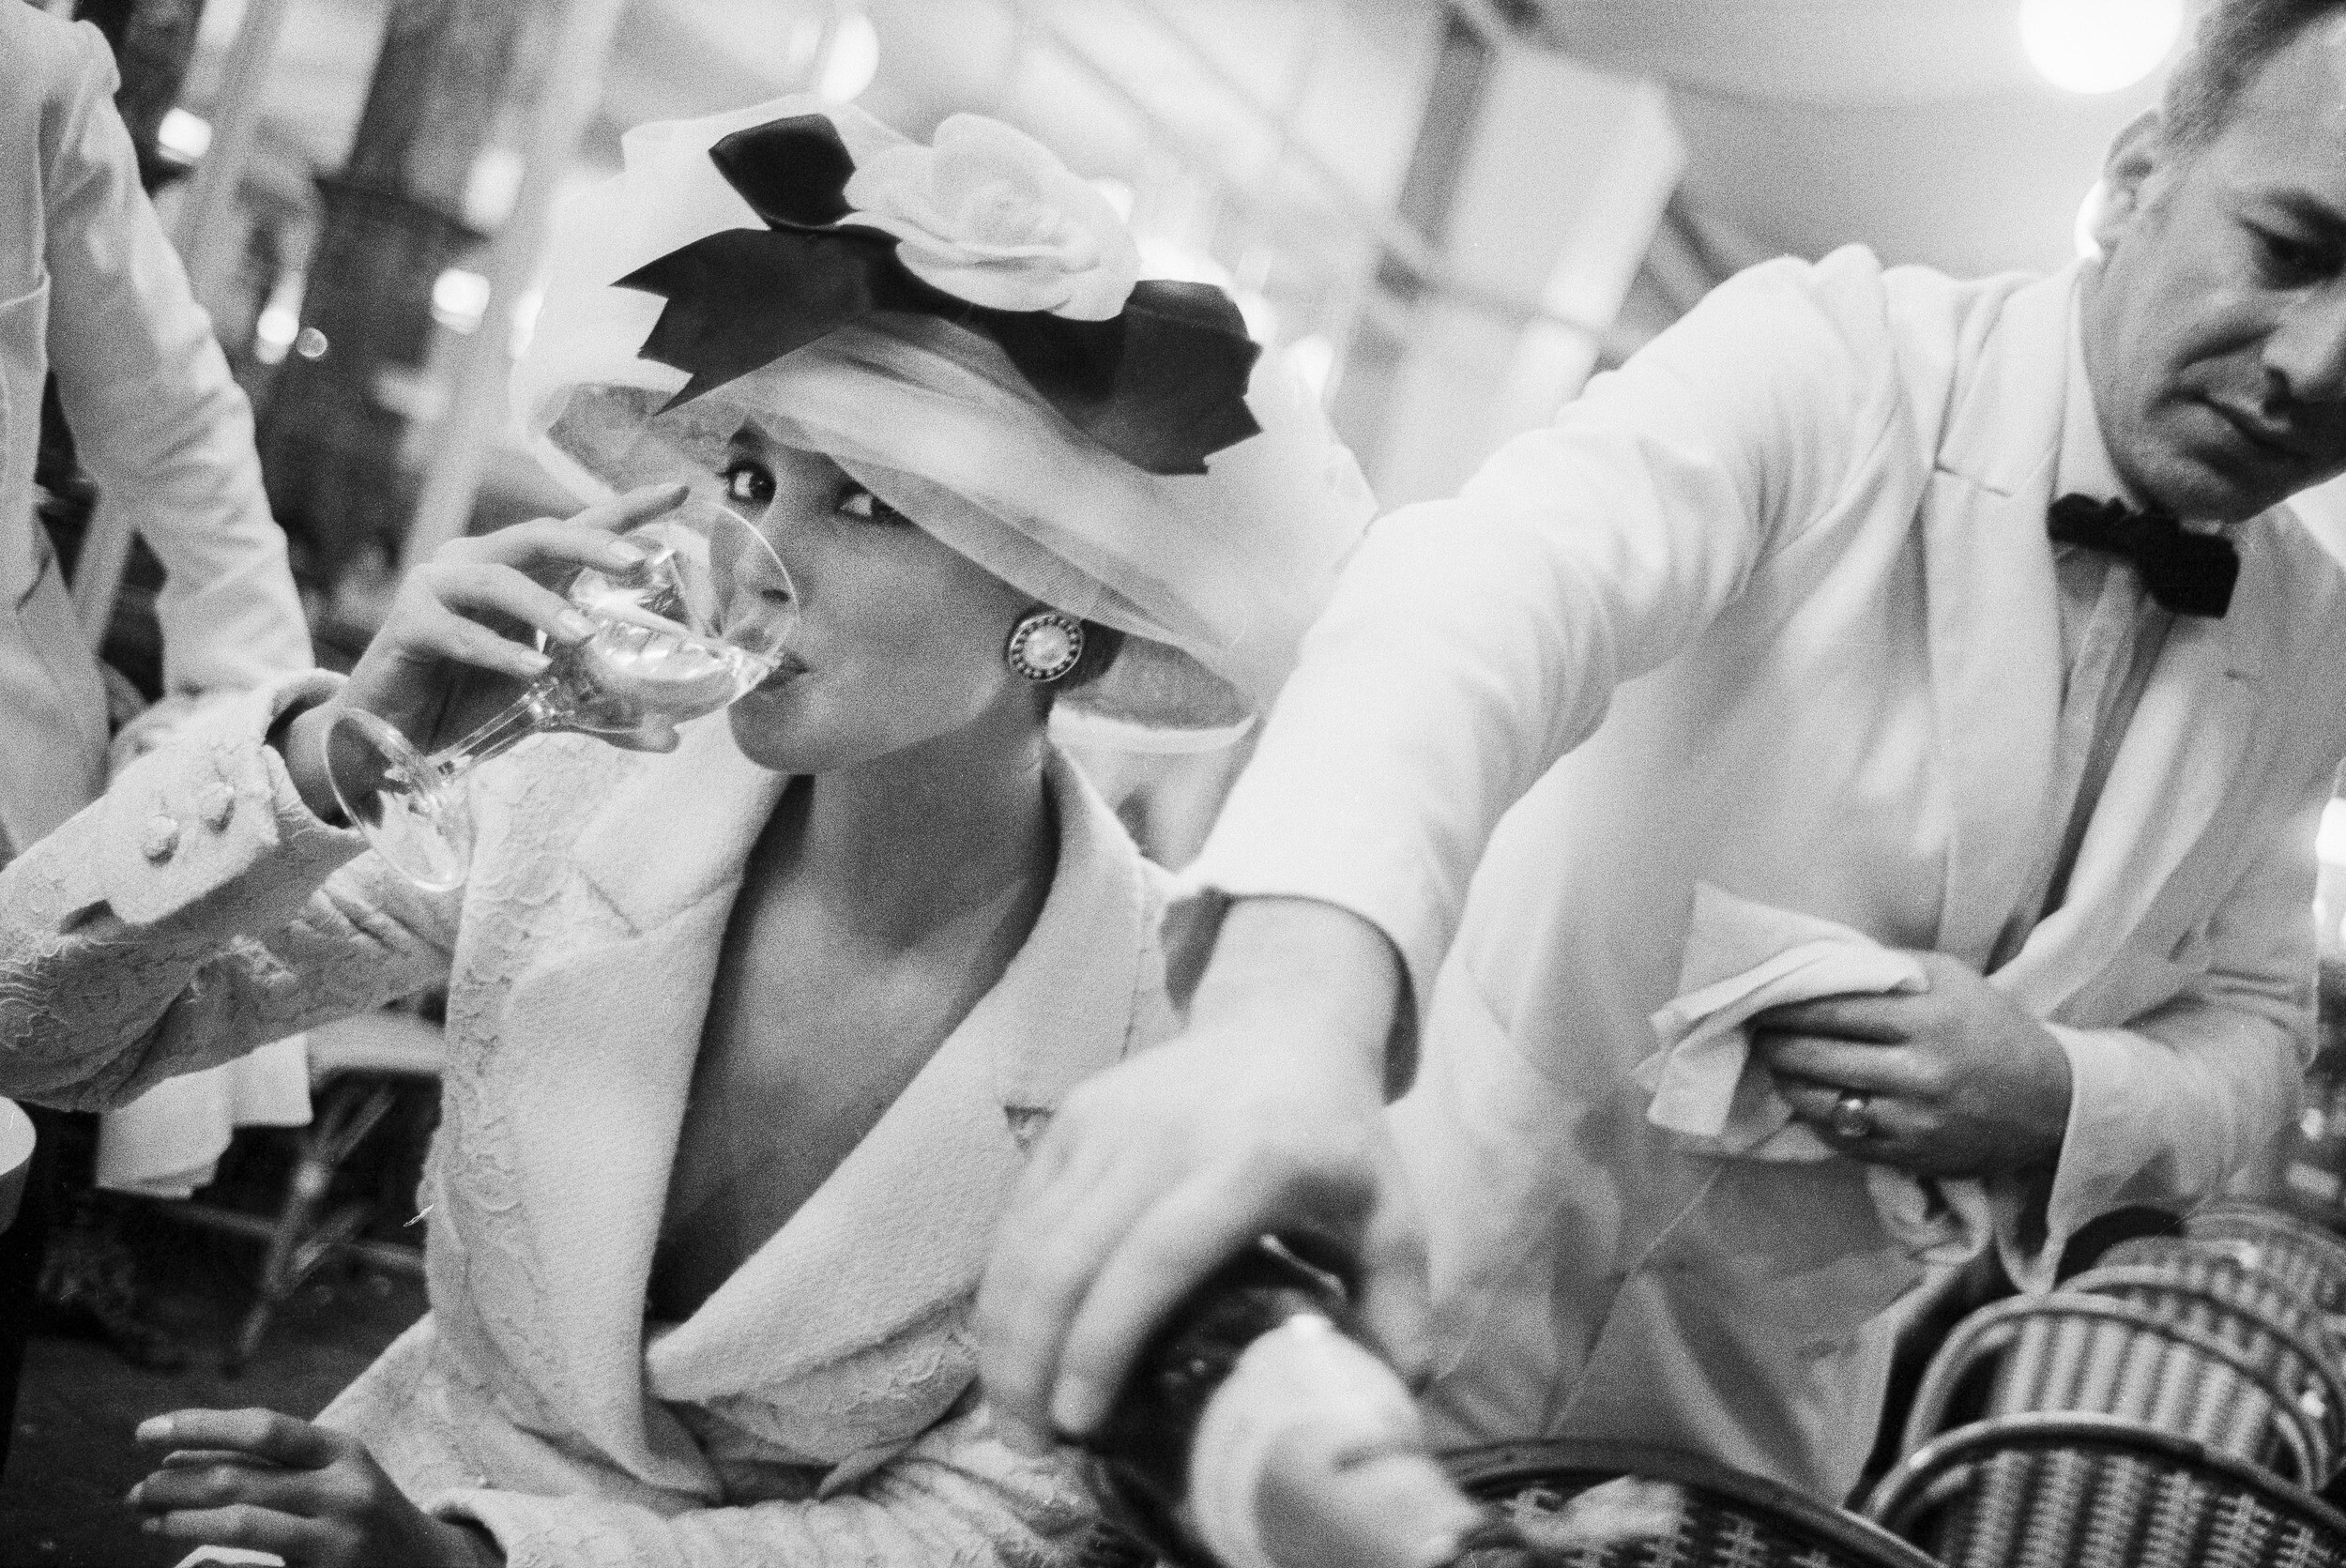 Кристи Тарлингтон, Париж, British Vogue, 1988. Автор Артур Элгорт